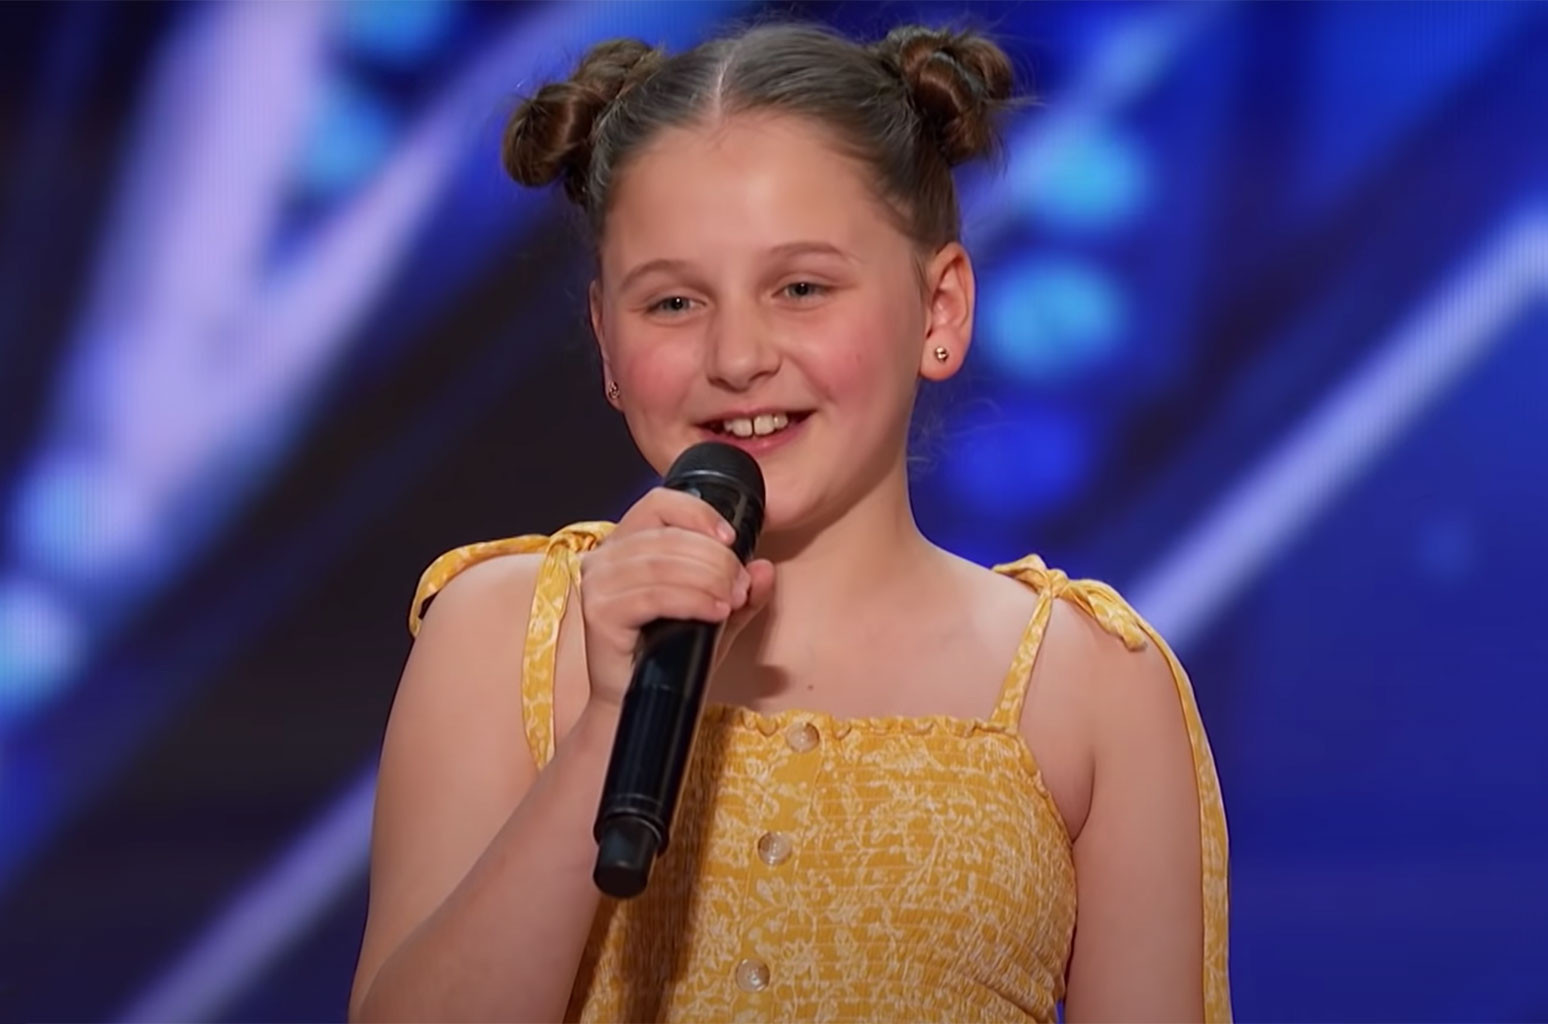 Annie Jones performs America's Got Talent.